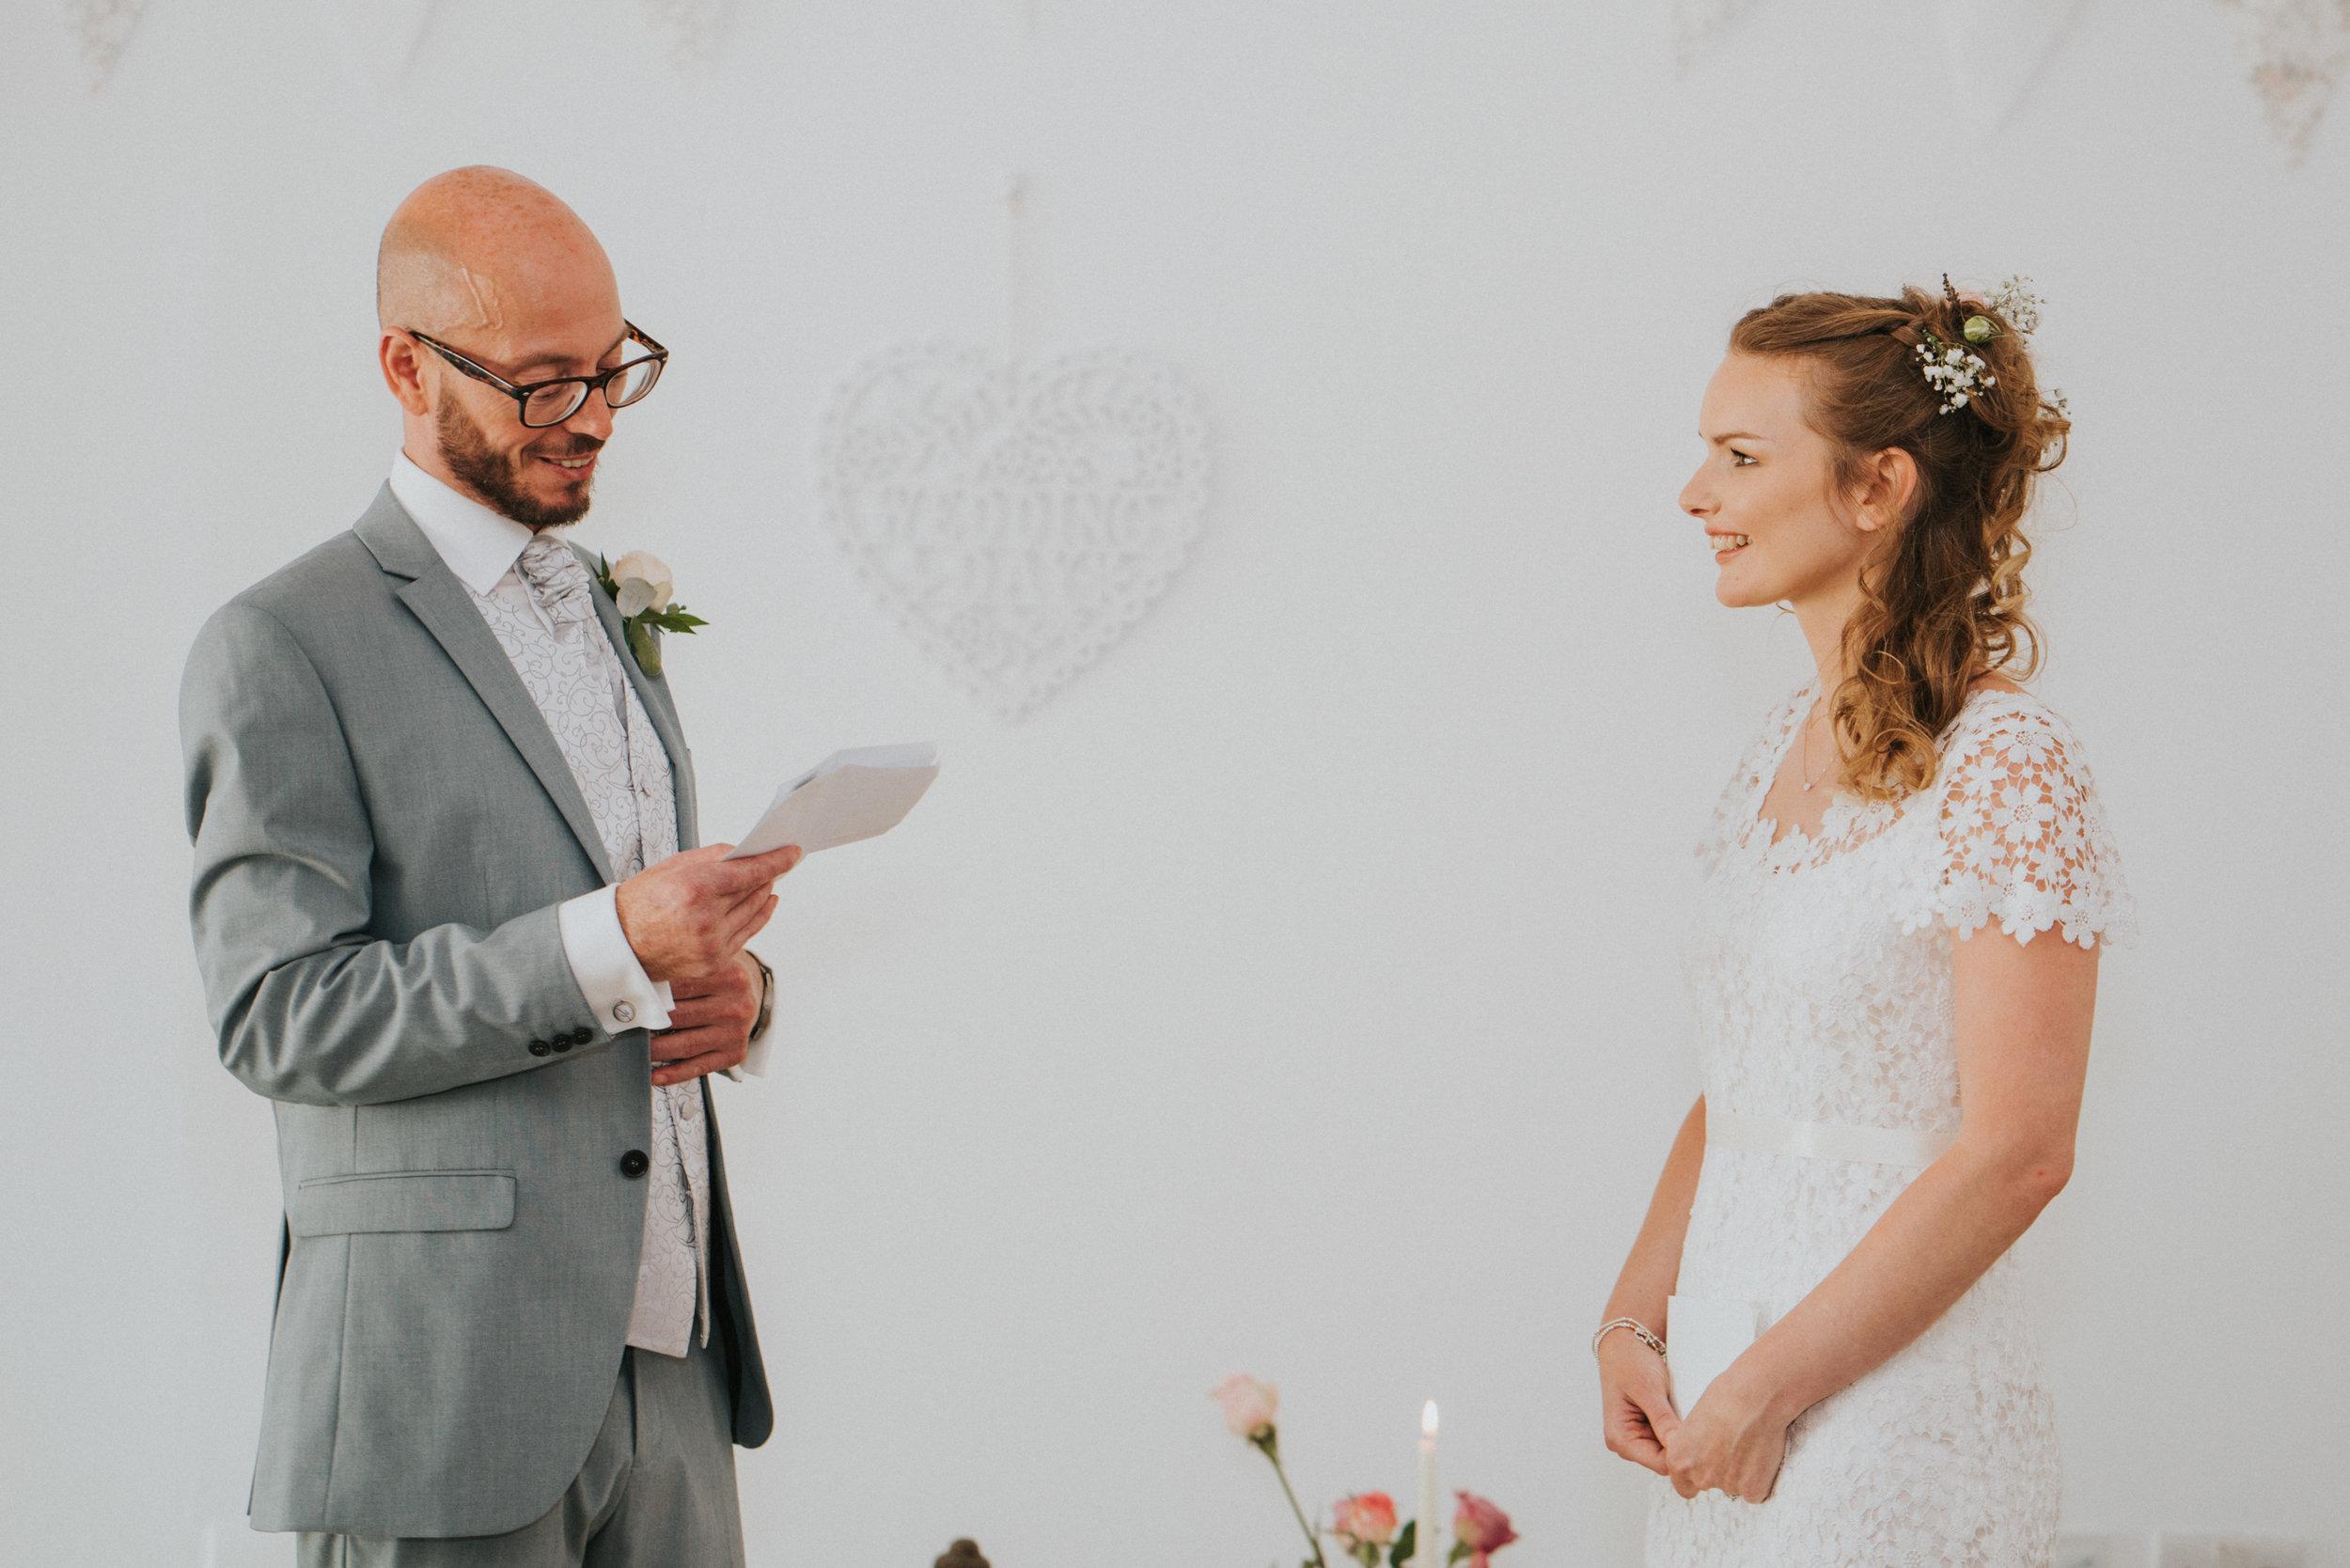 Grace-Elizabeth-Georgie-Amalaketu-Firstsite-Colchester-Essex-Boho-Buddhist-Wedding-Alternative-Wedding-Photography-Essex (55 of 100).jpg